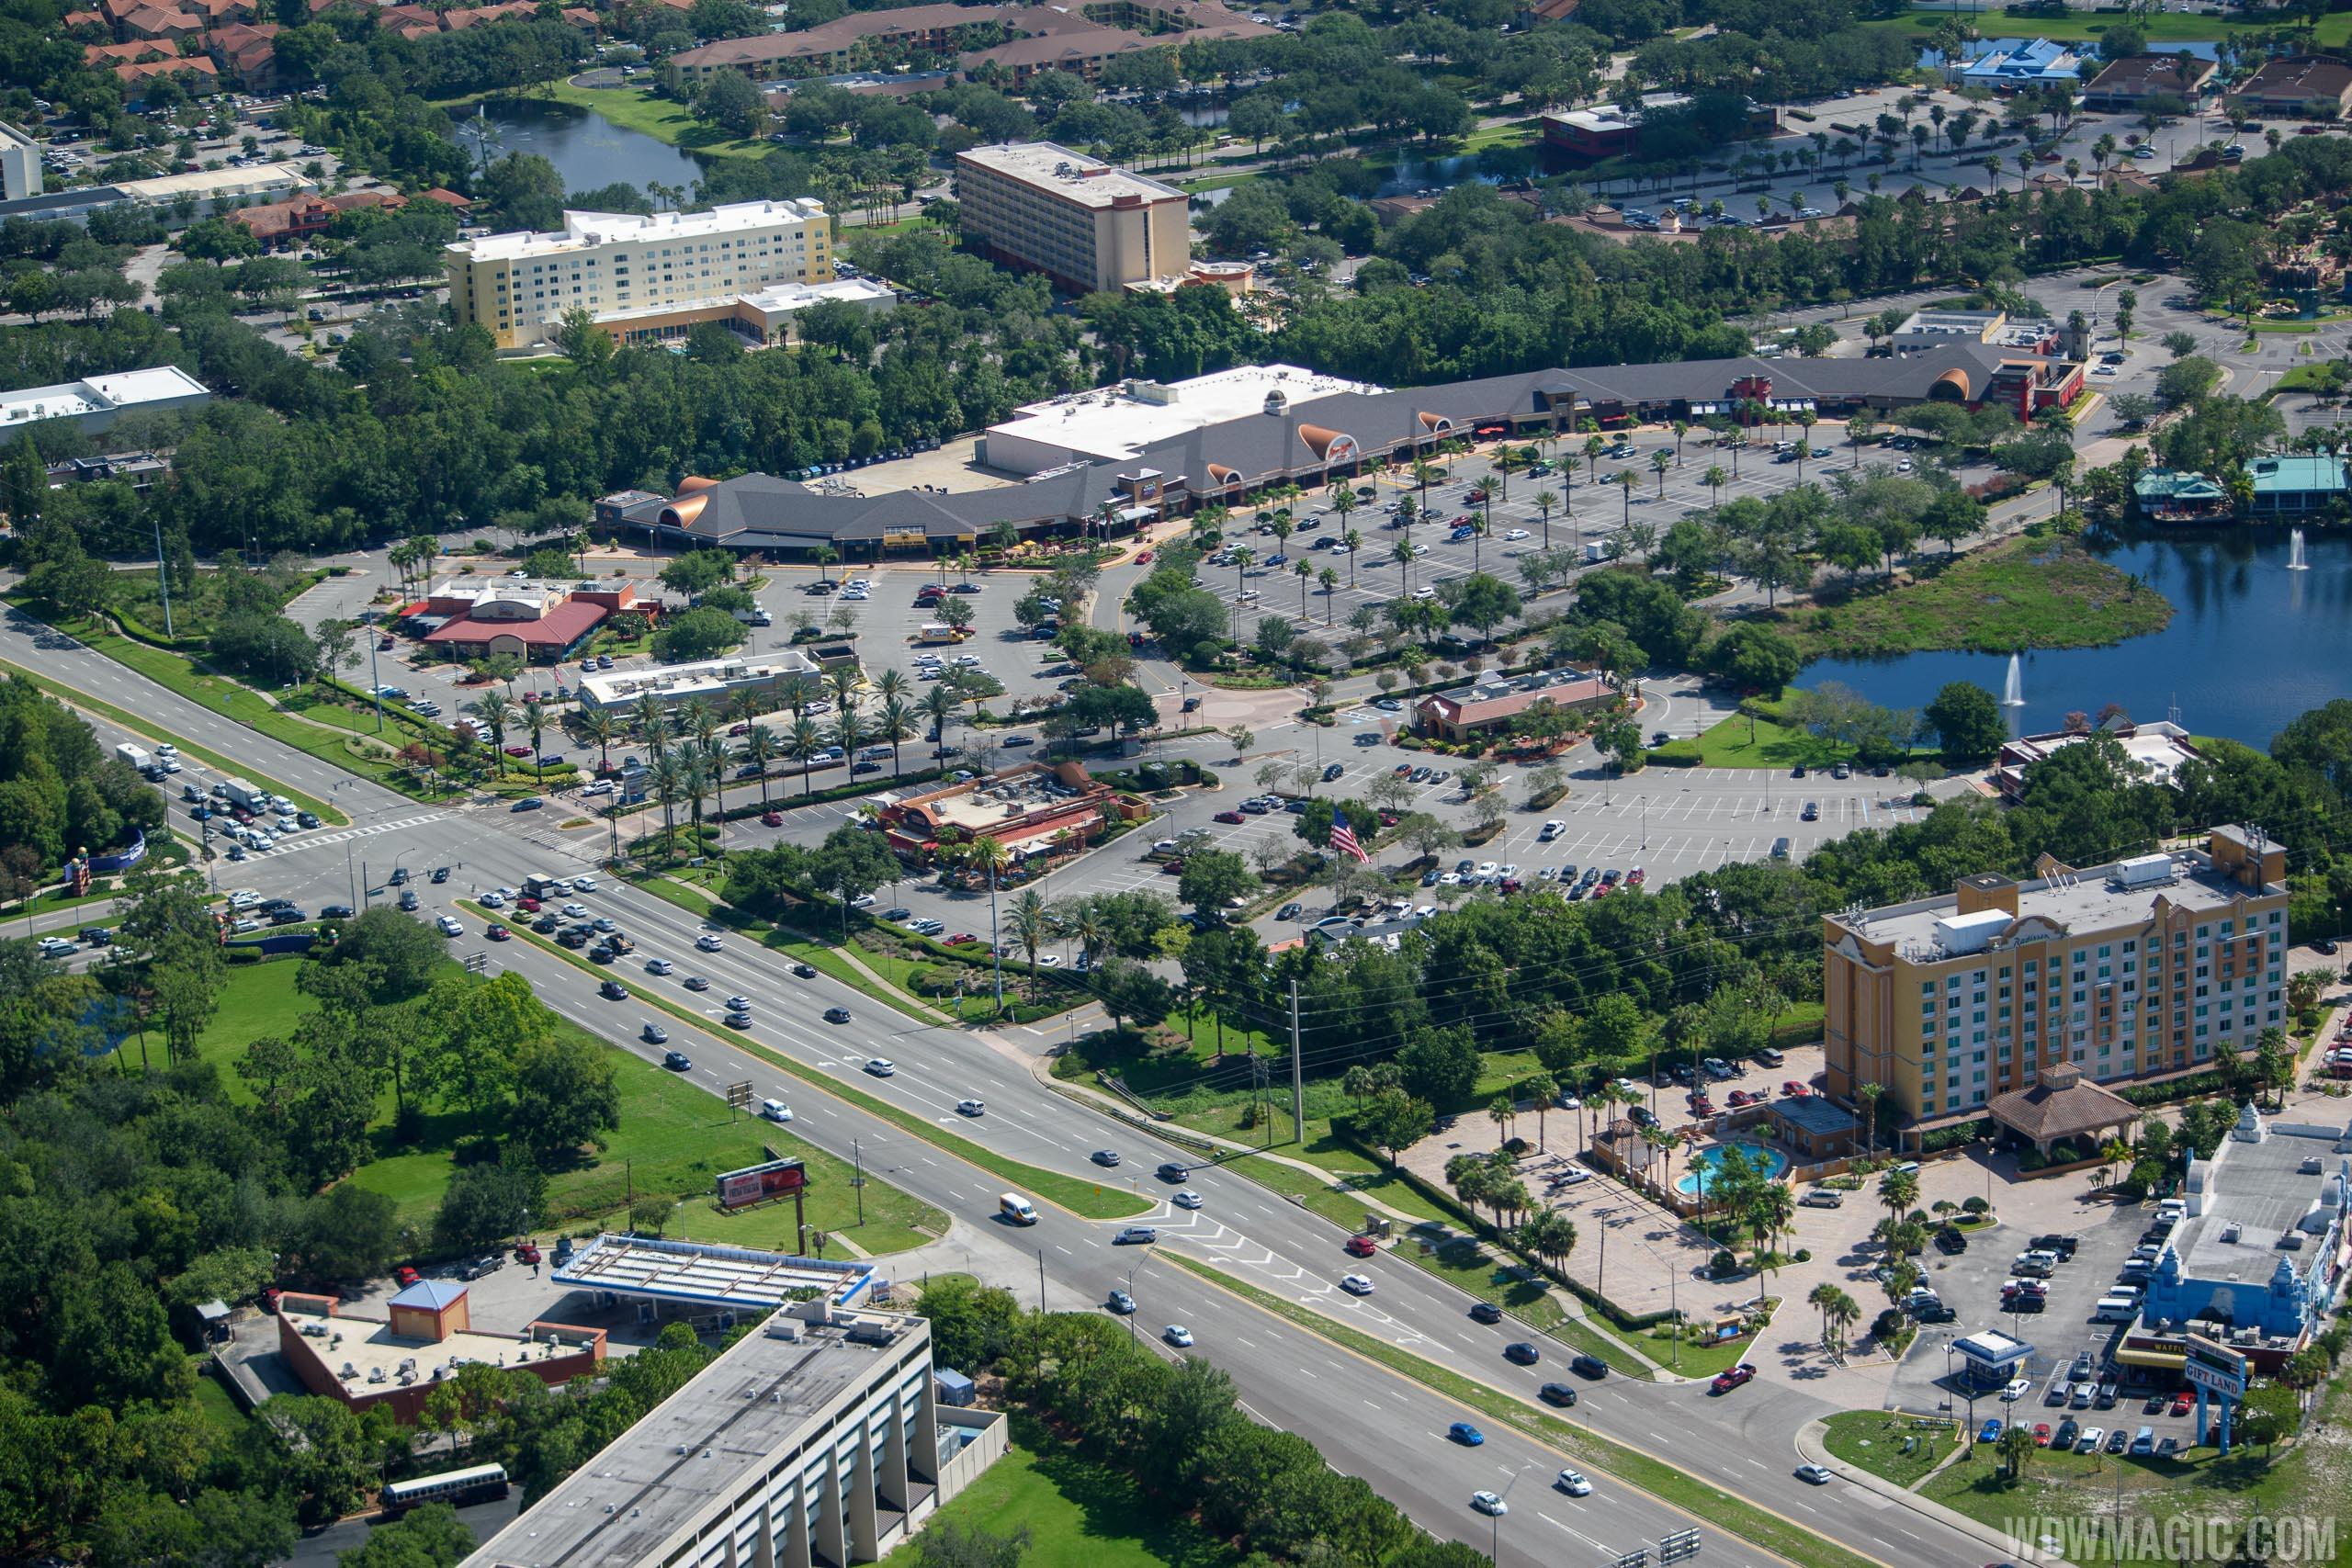 Crossroads aerial views